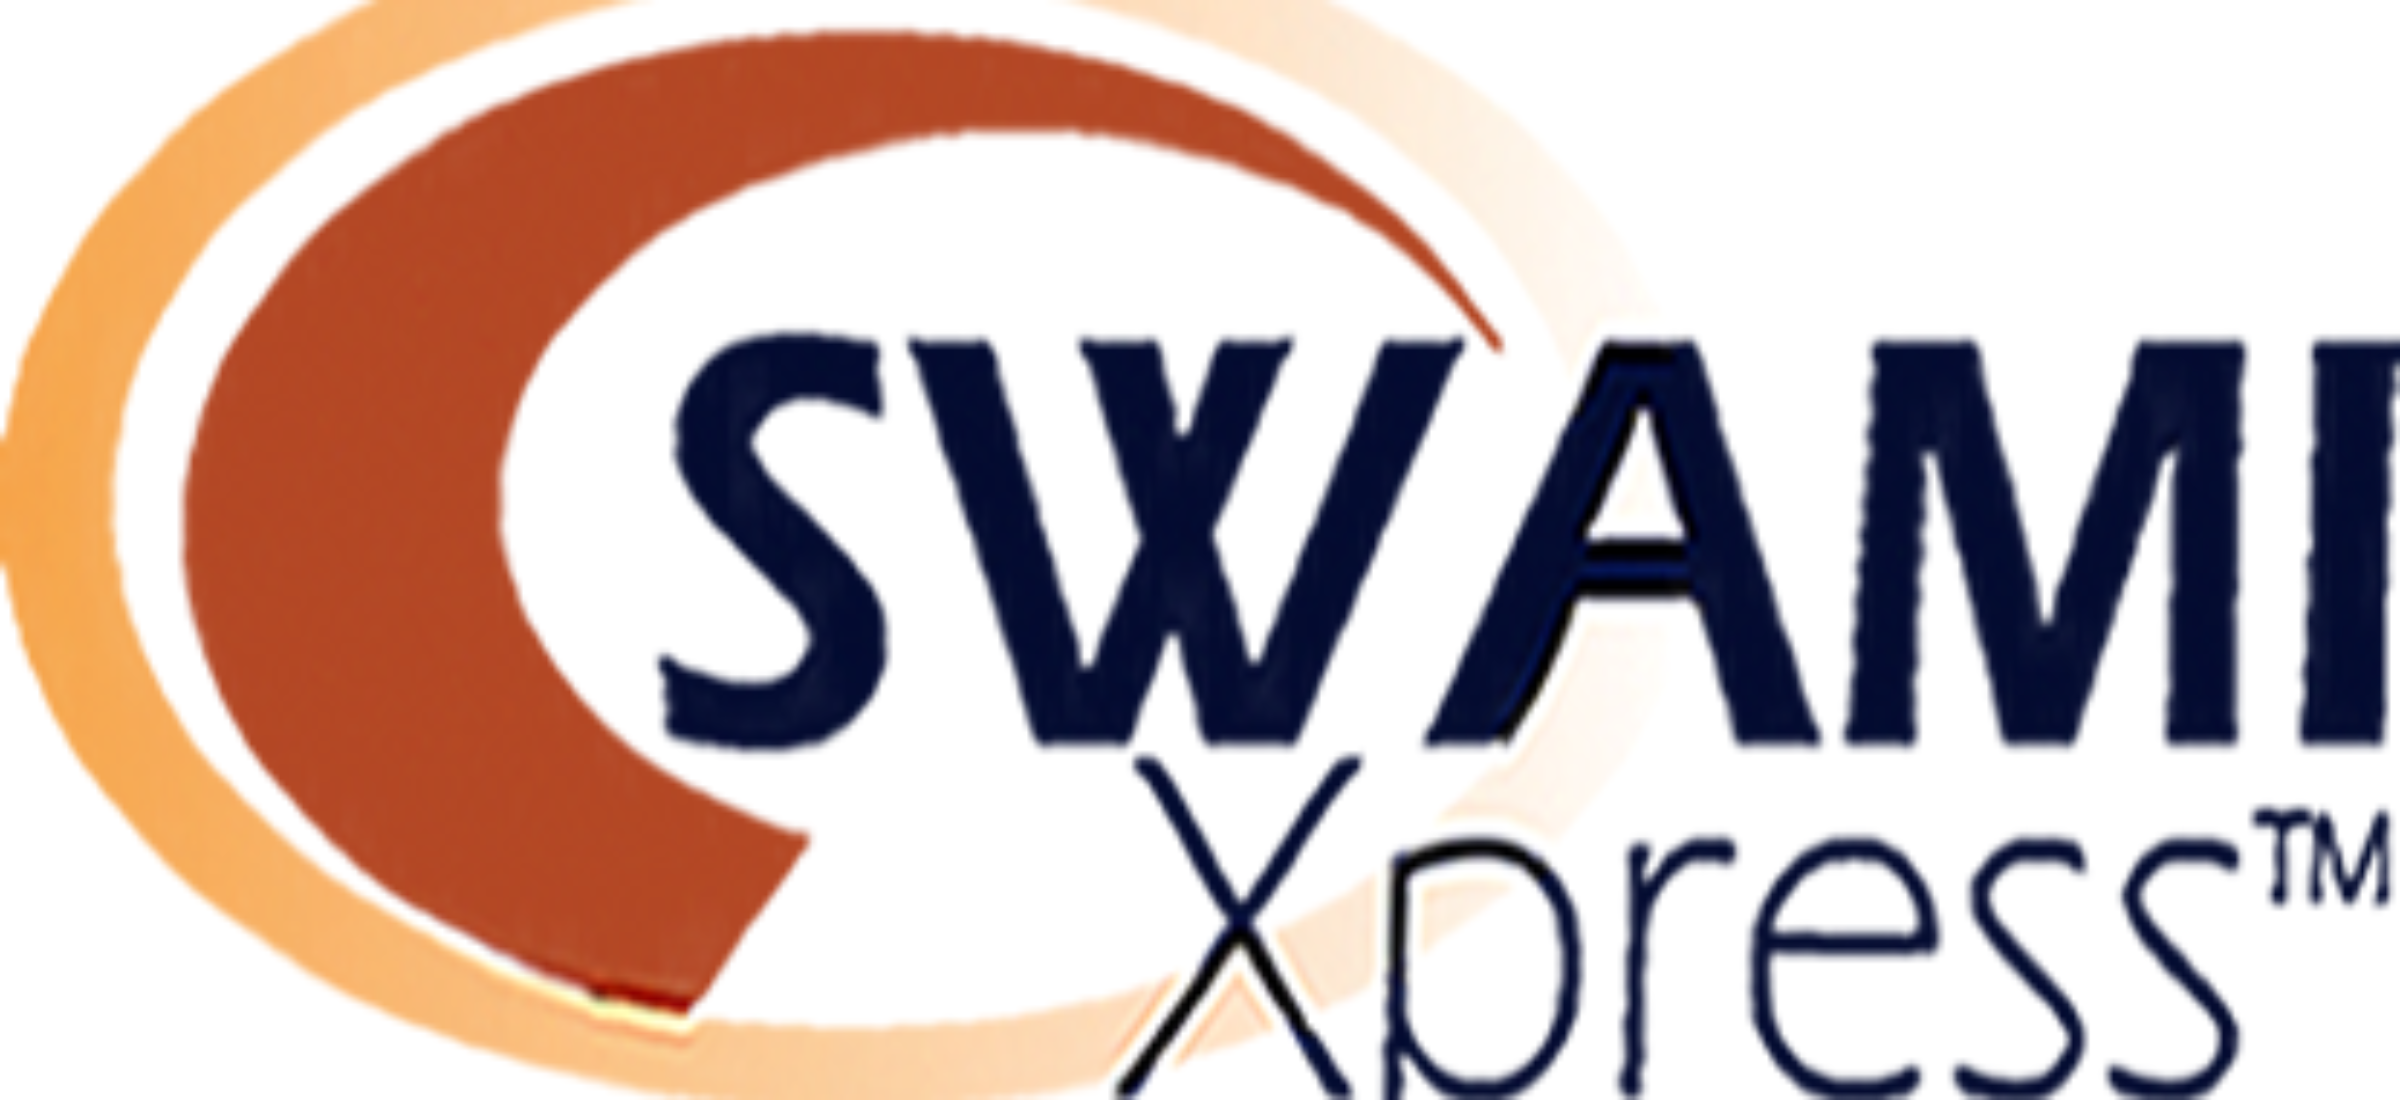 Program pro stanovení genotypu - SWAMI Xpress je tu!